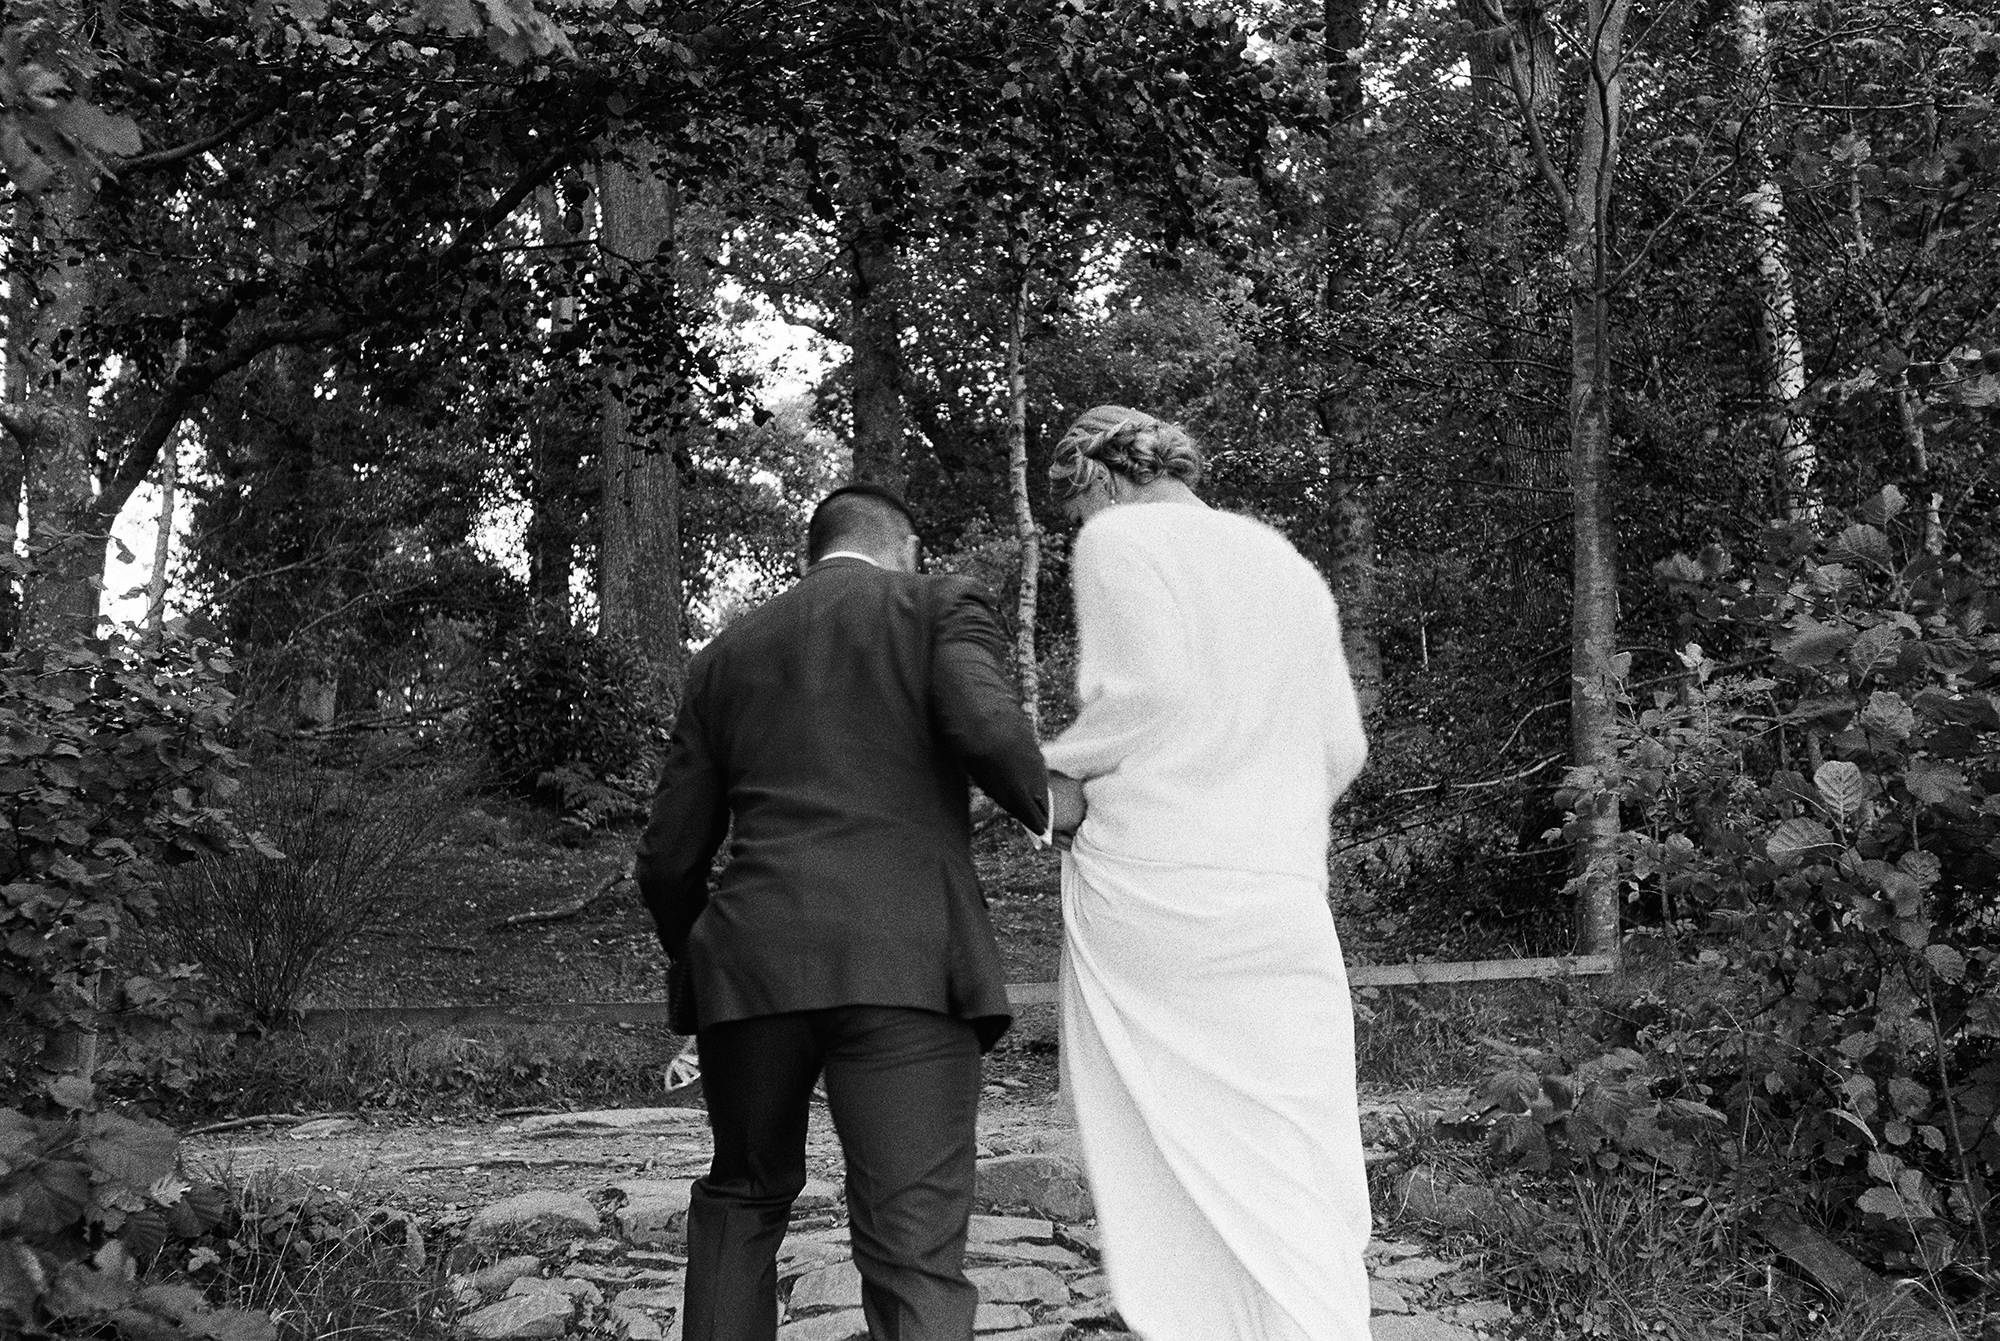 wedding_photographer_cumbria035.jpg